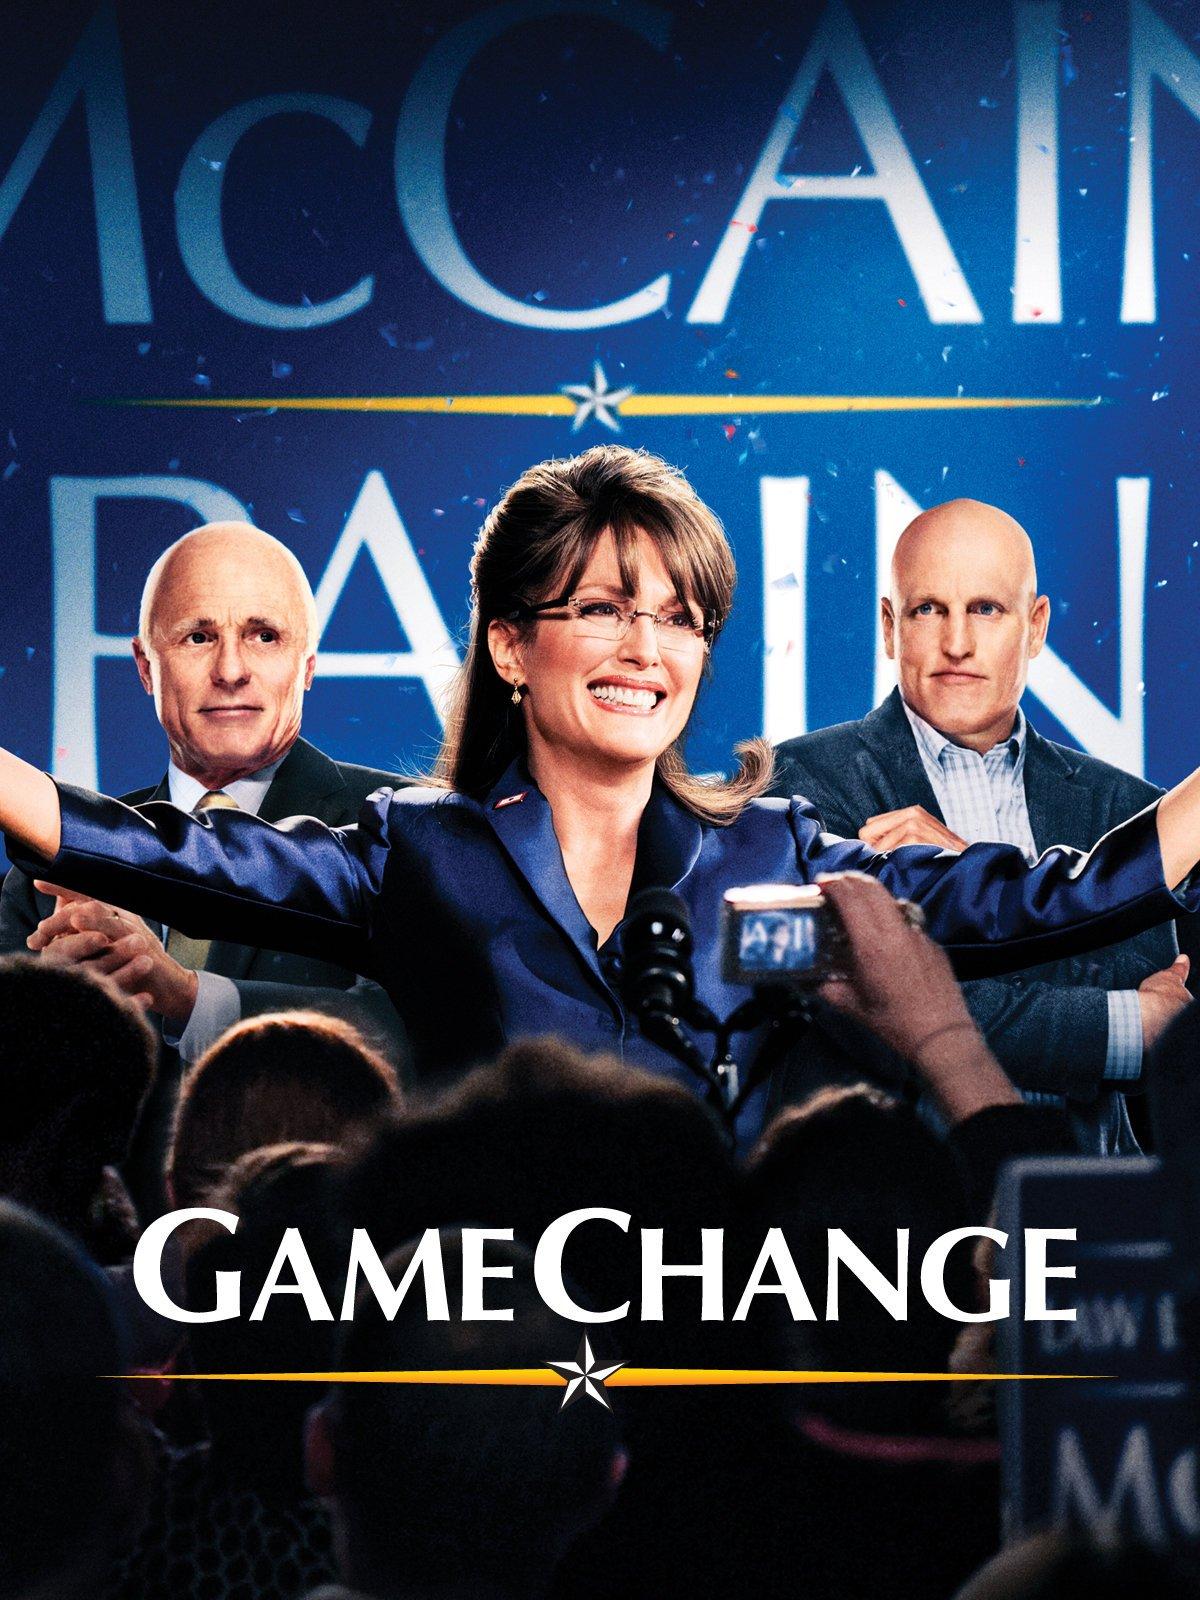 Game Change (2012) Hindi Dubbed